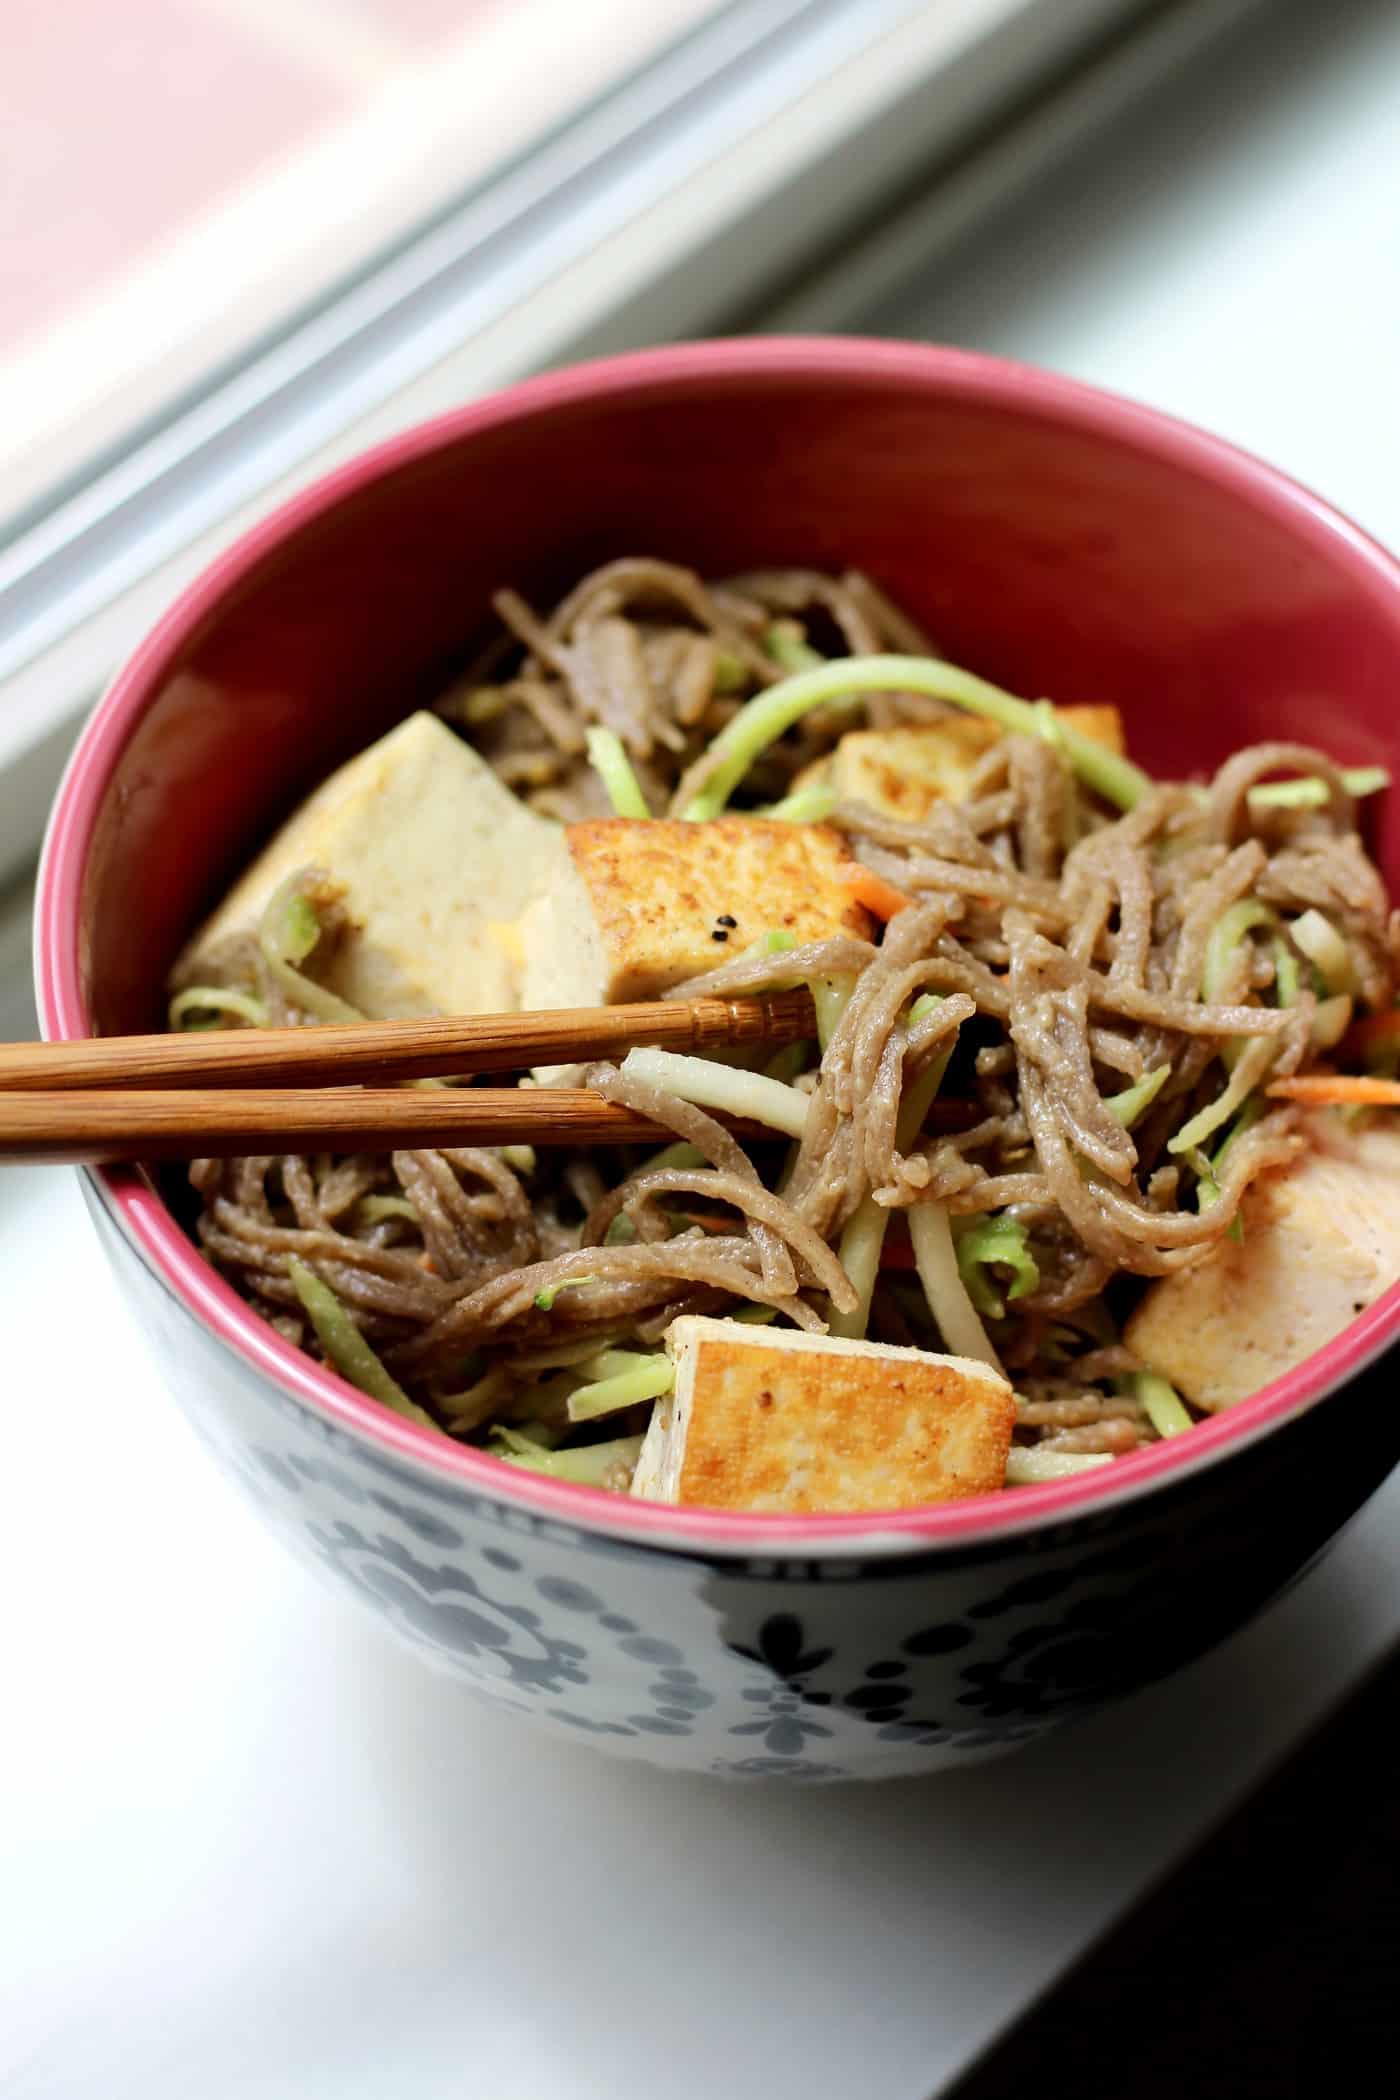 Cold Soba Noodles with Lemon-Almond Dressing